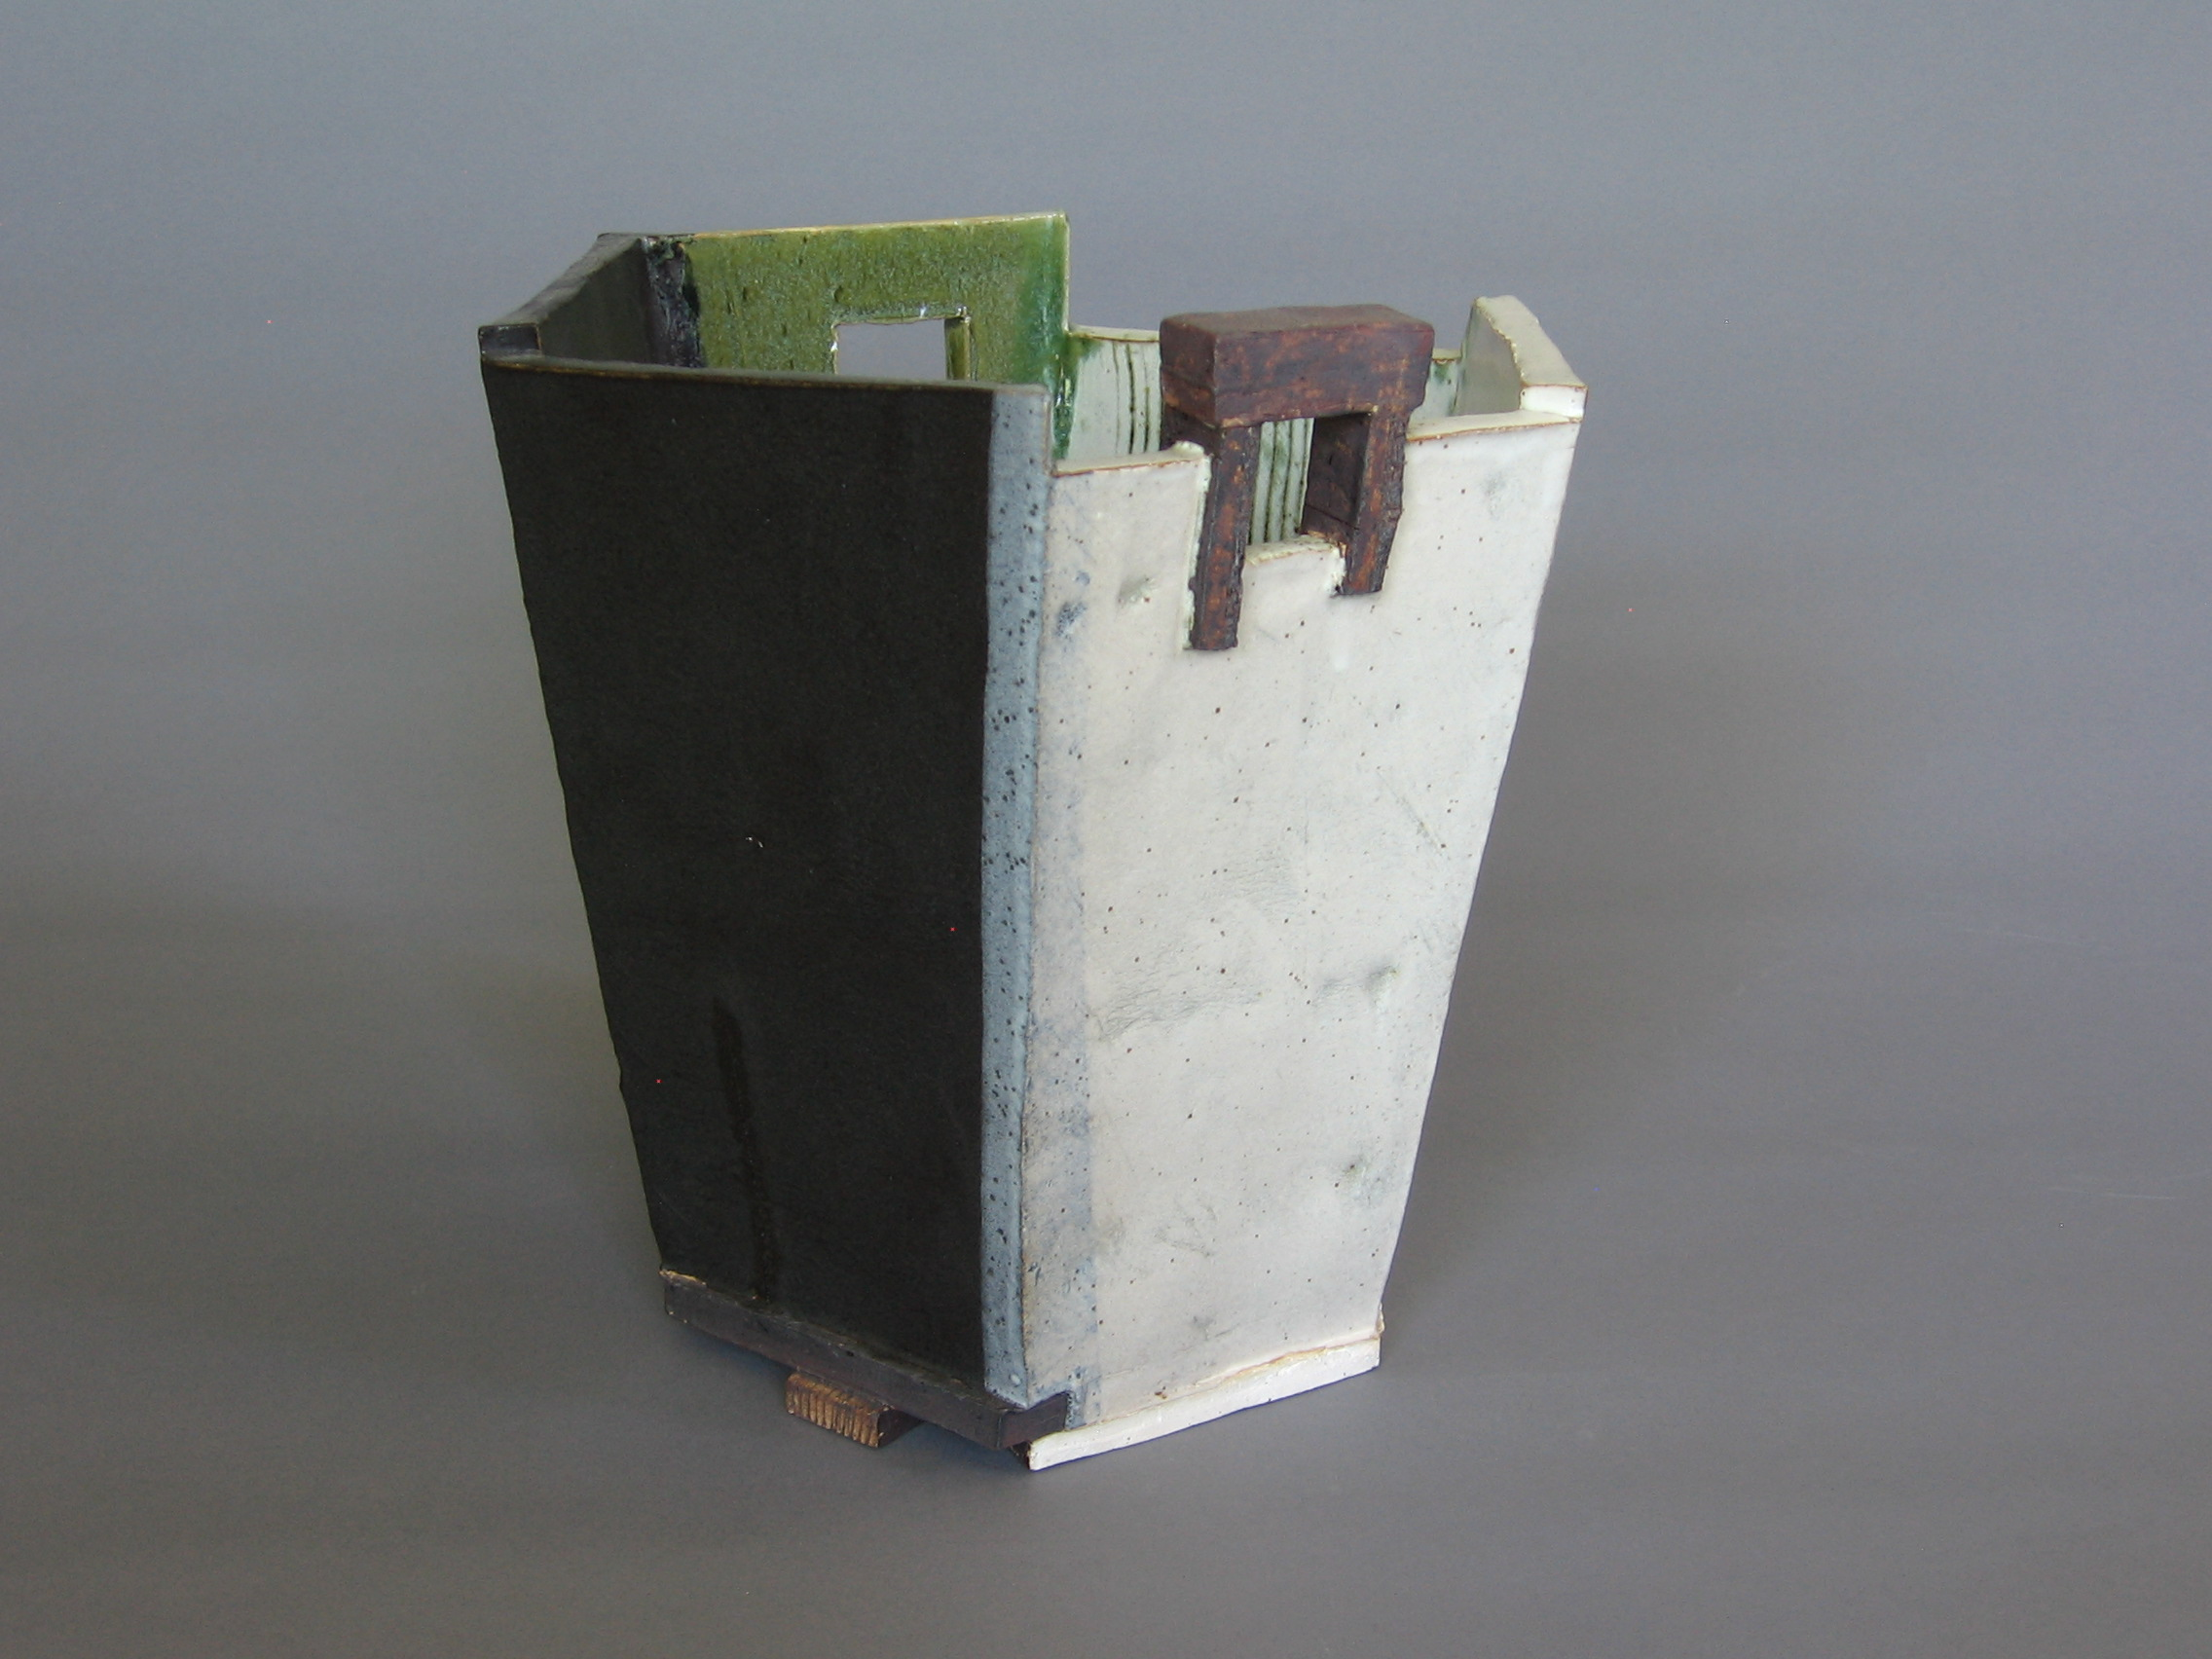 "Kübel 4 , 9.5"" x 9.5"" x 10"", Ceramic"